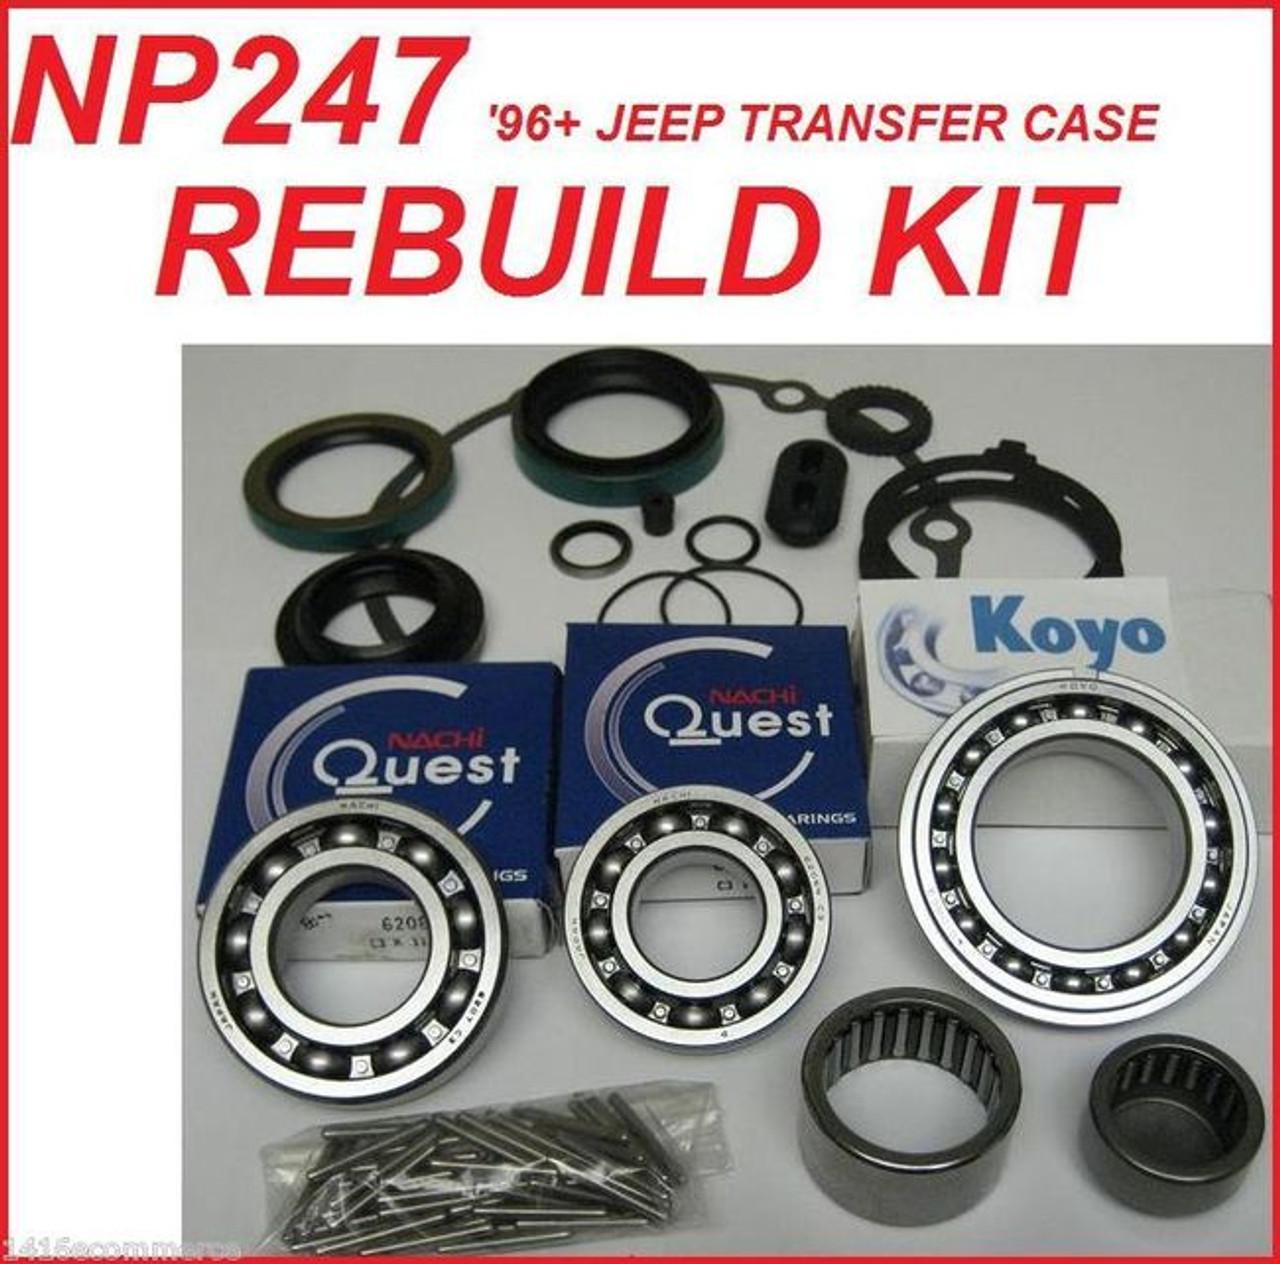 1996 jeep grand cherokee transmission rebuild